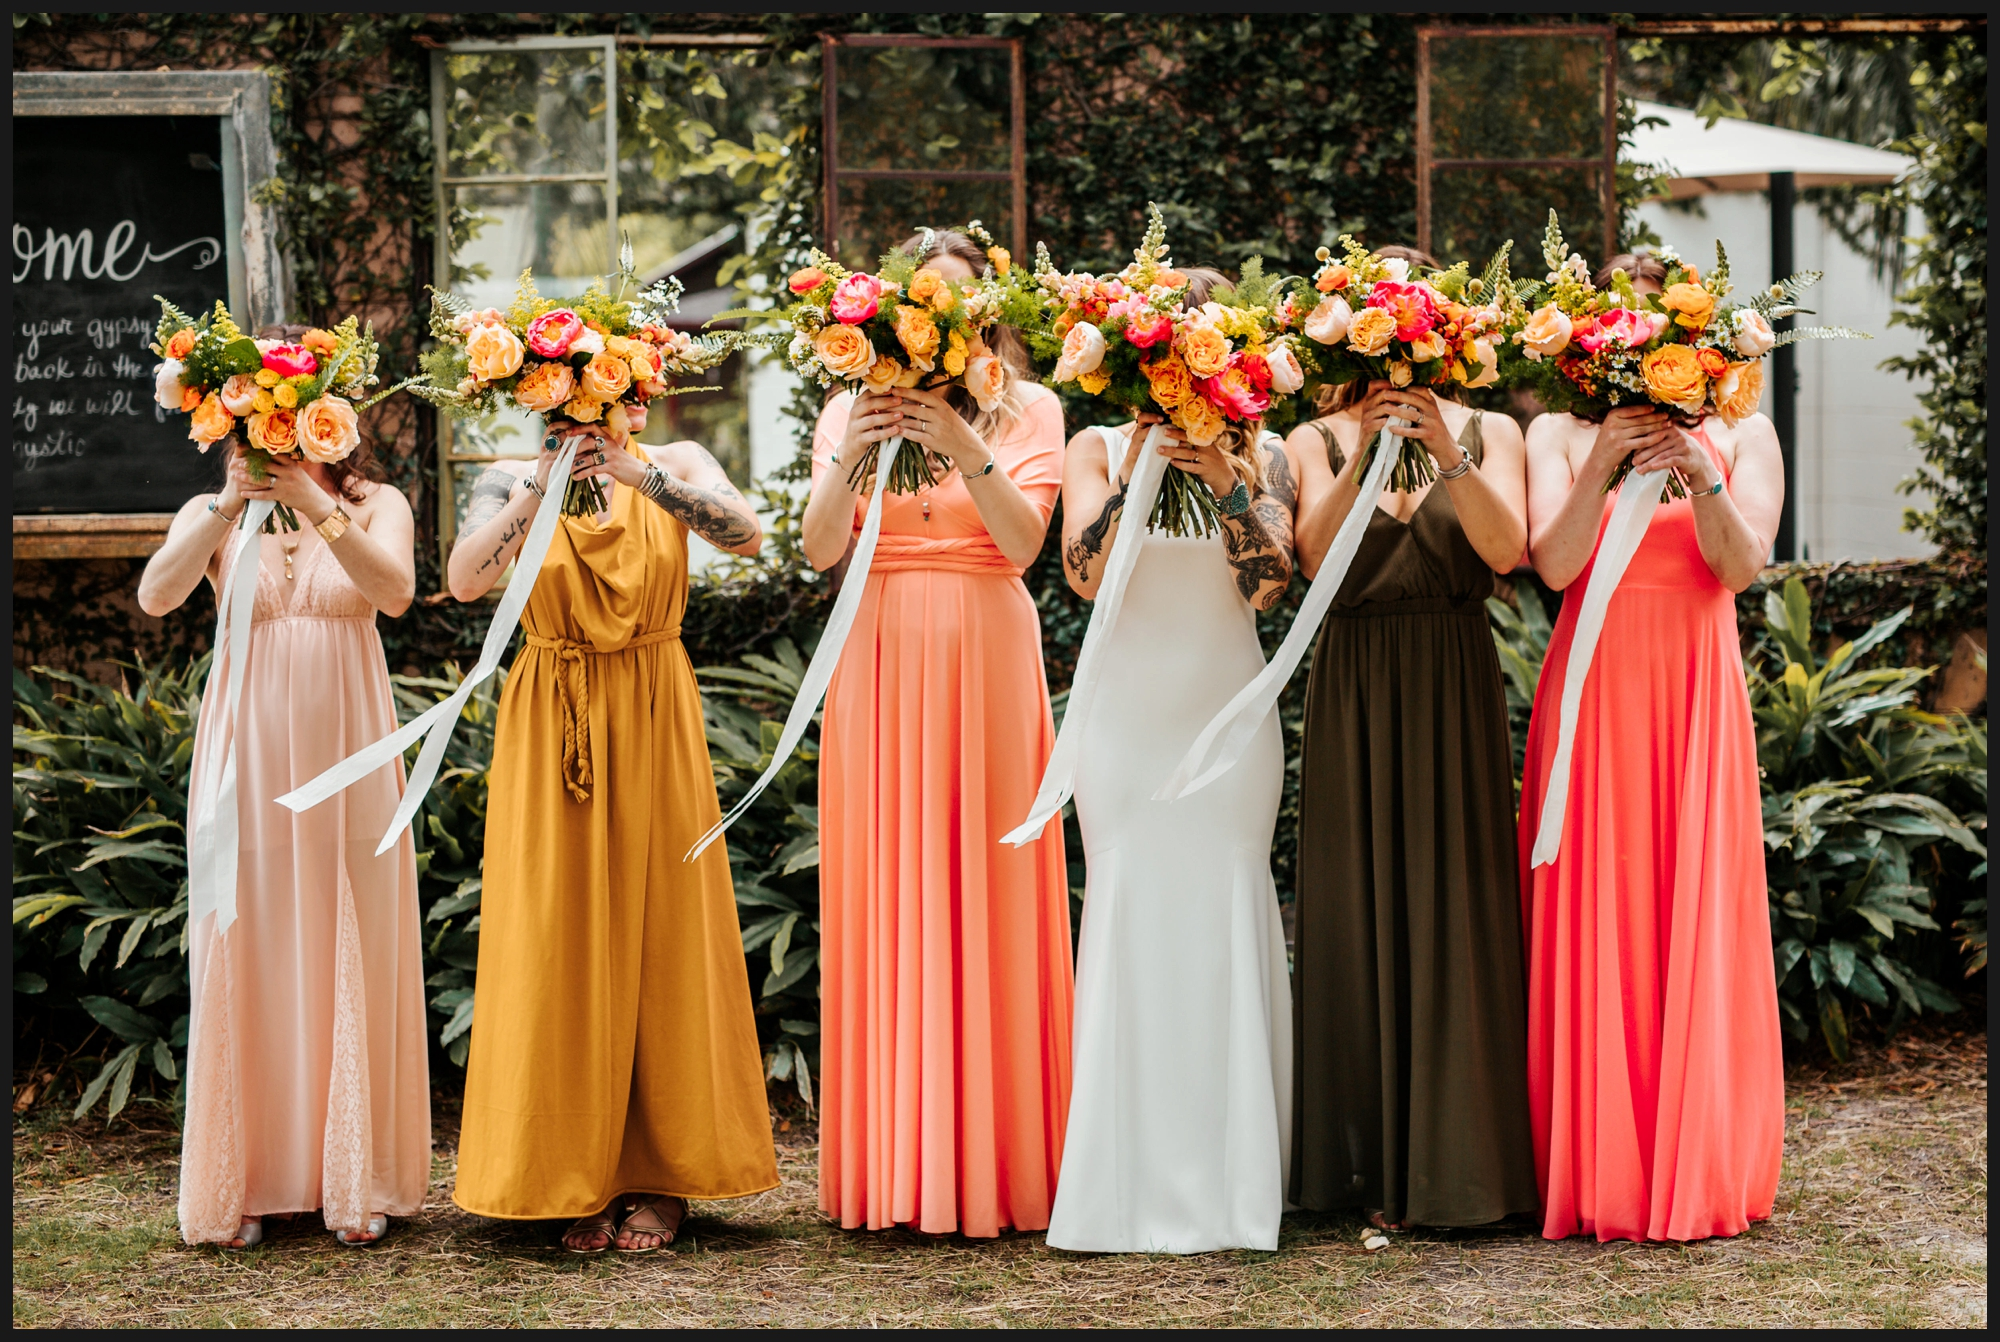 Orlando-Wedding-Photographer-destination-wedding-photographer-florida-wedding-photographer-bohemian-wedding-photographer_1981.jpg